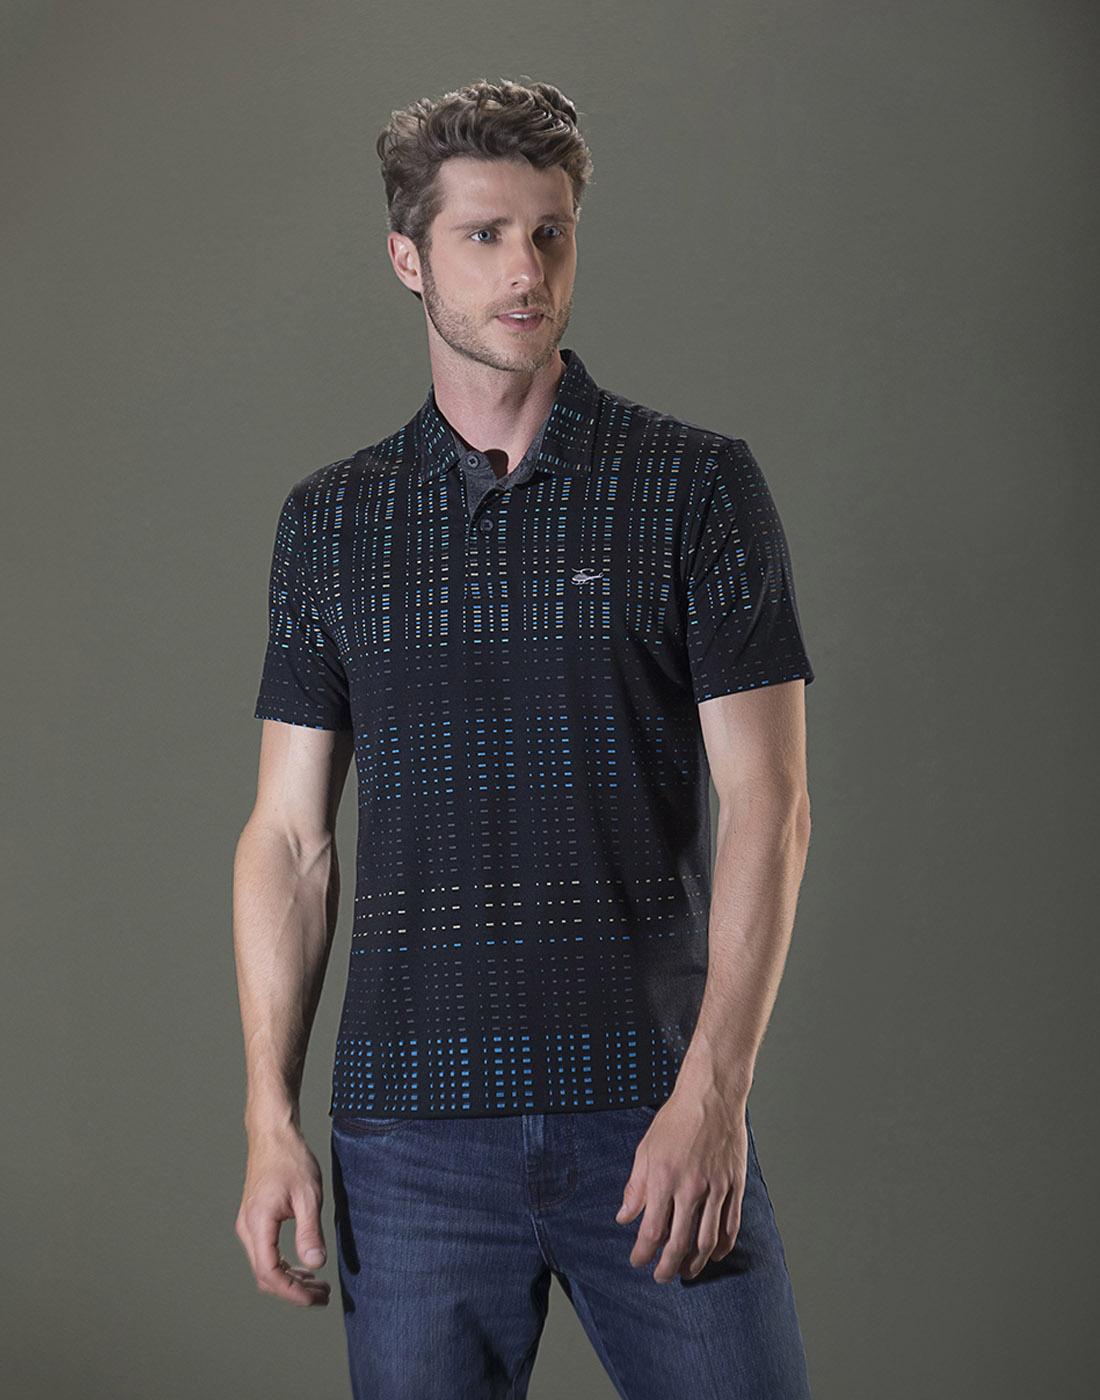 Camiseta Polo Estampada Preto Sallo